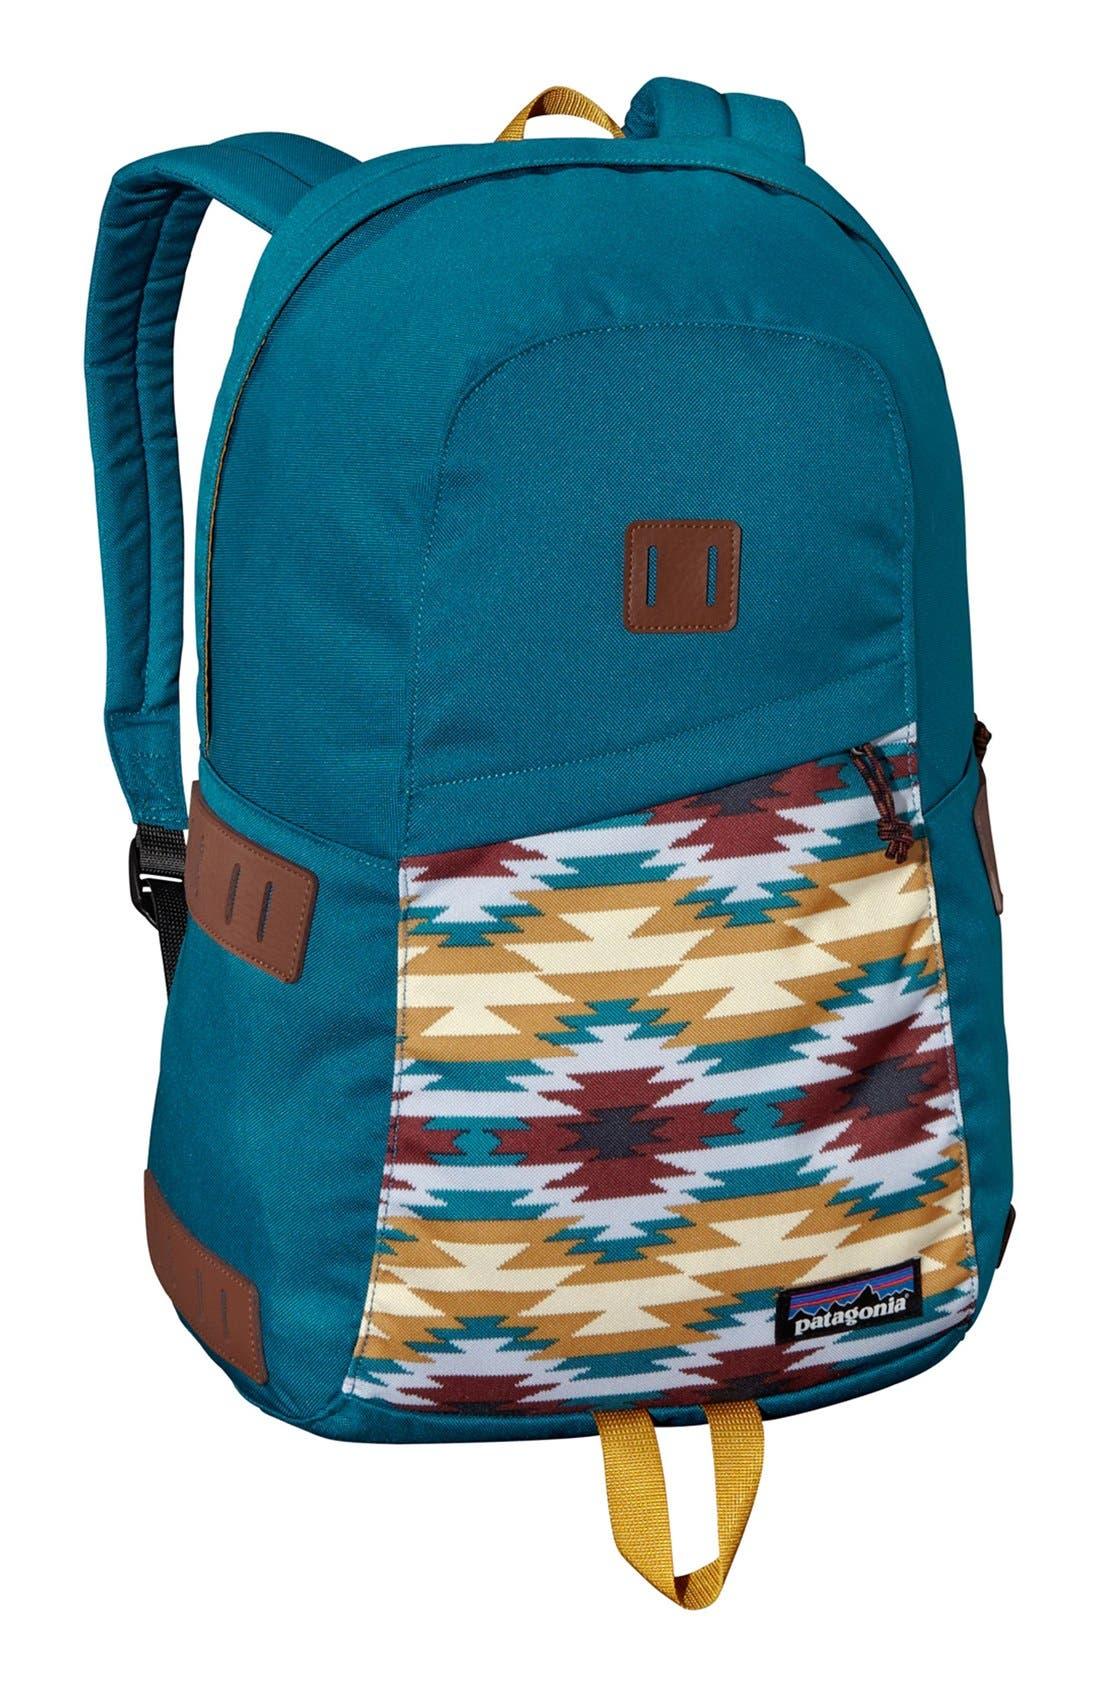 Alternate Image 1 Selected - Patagonia 'Ironwood' Backpack (20 Liter)